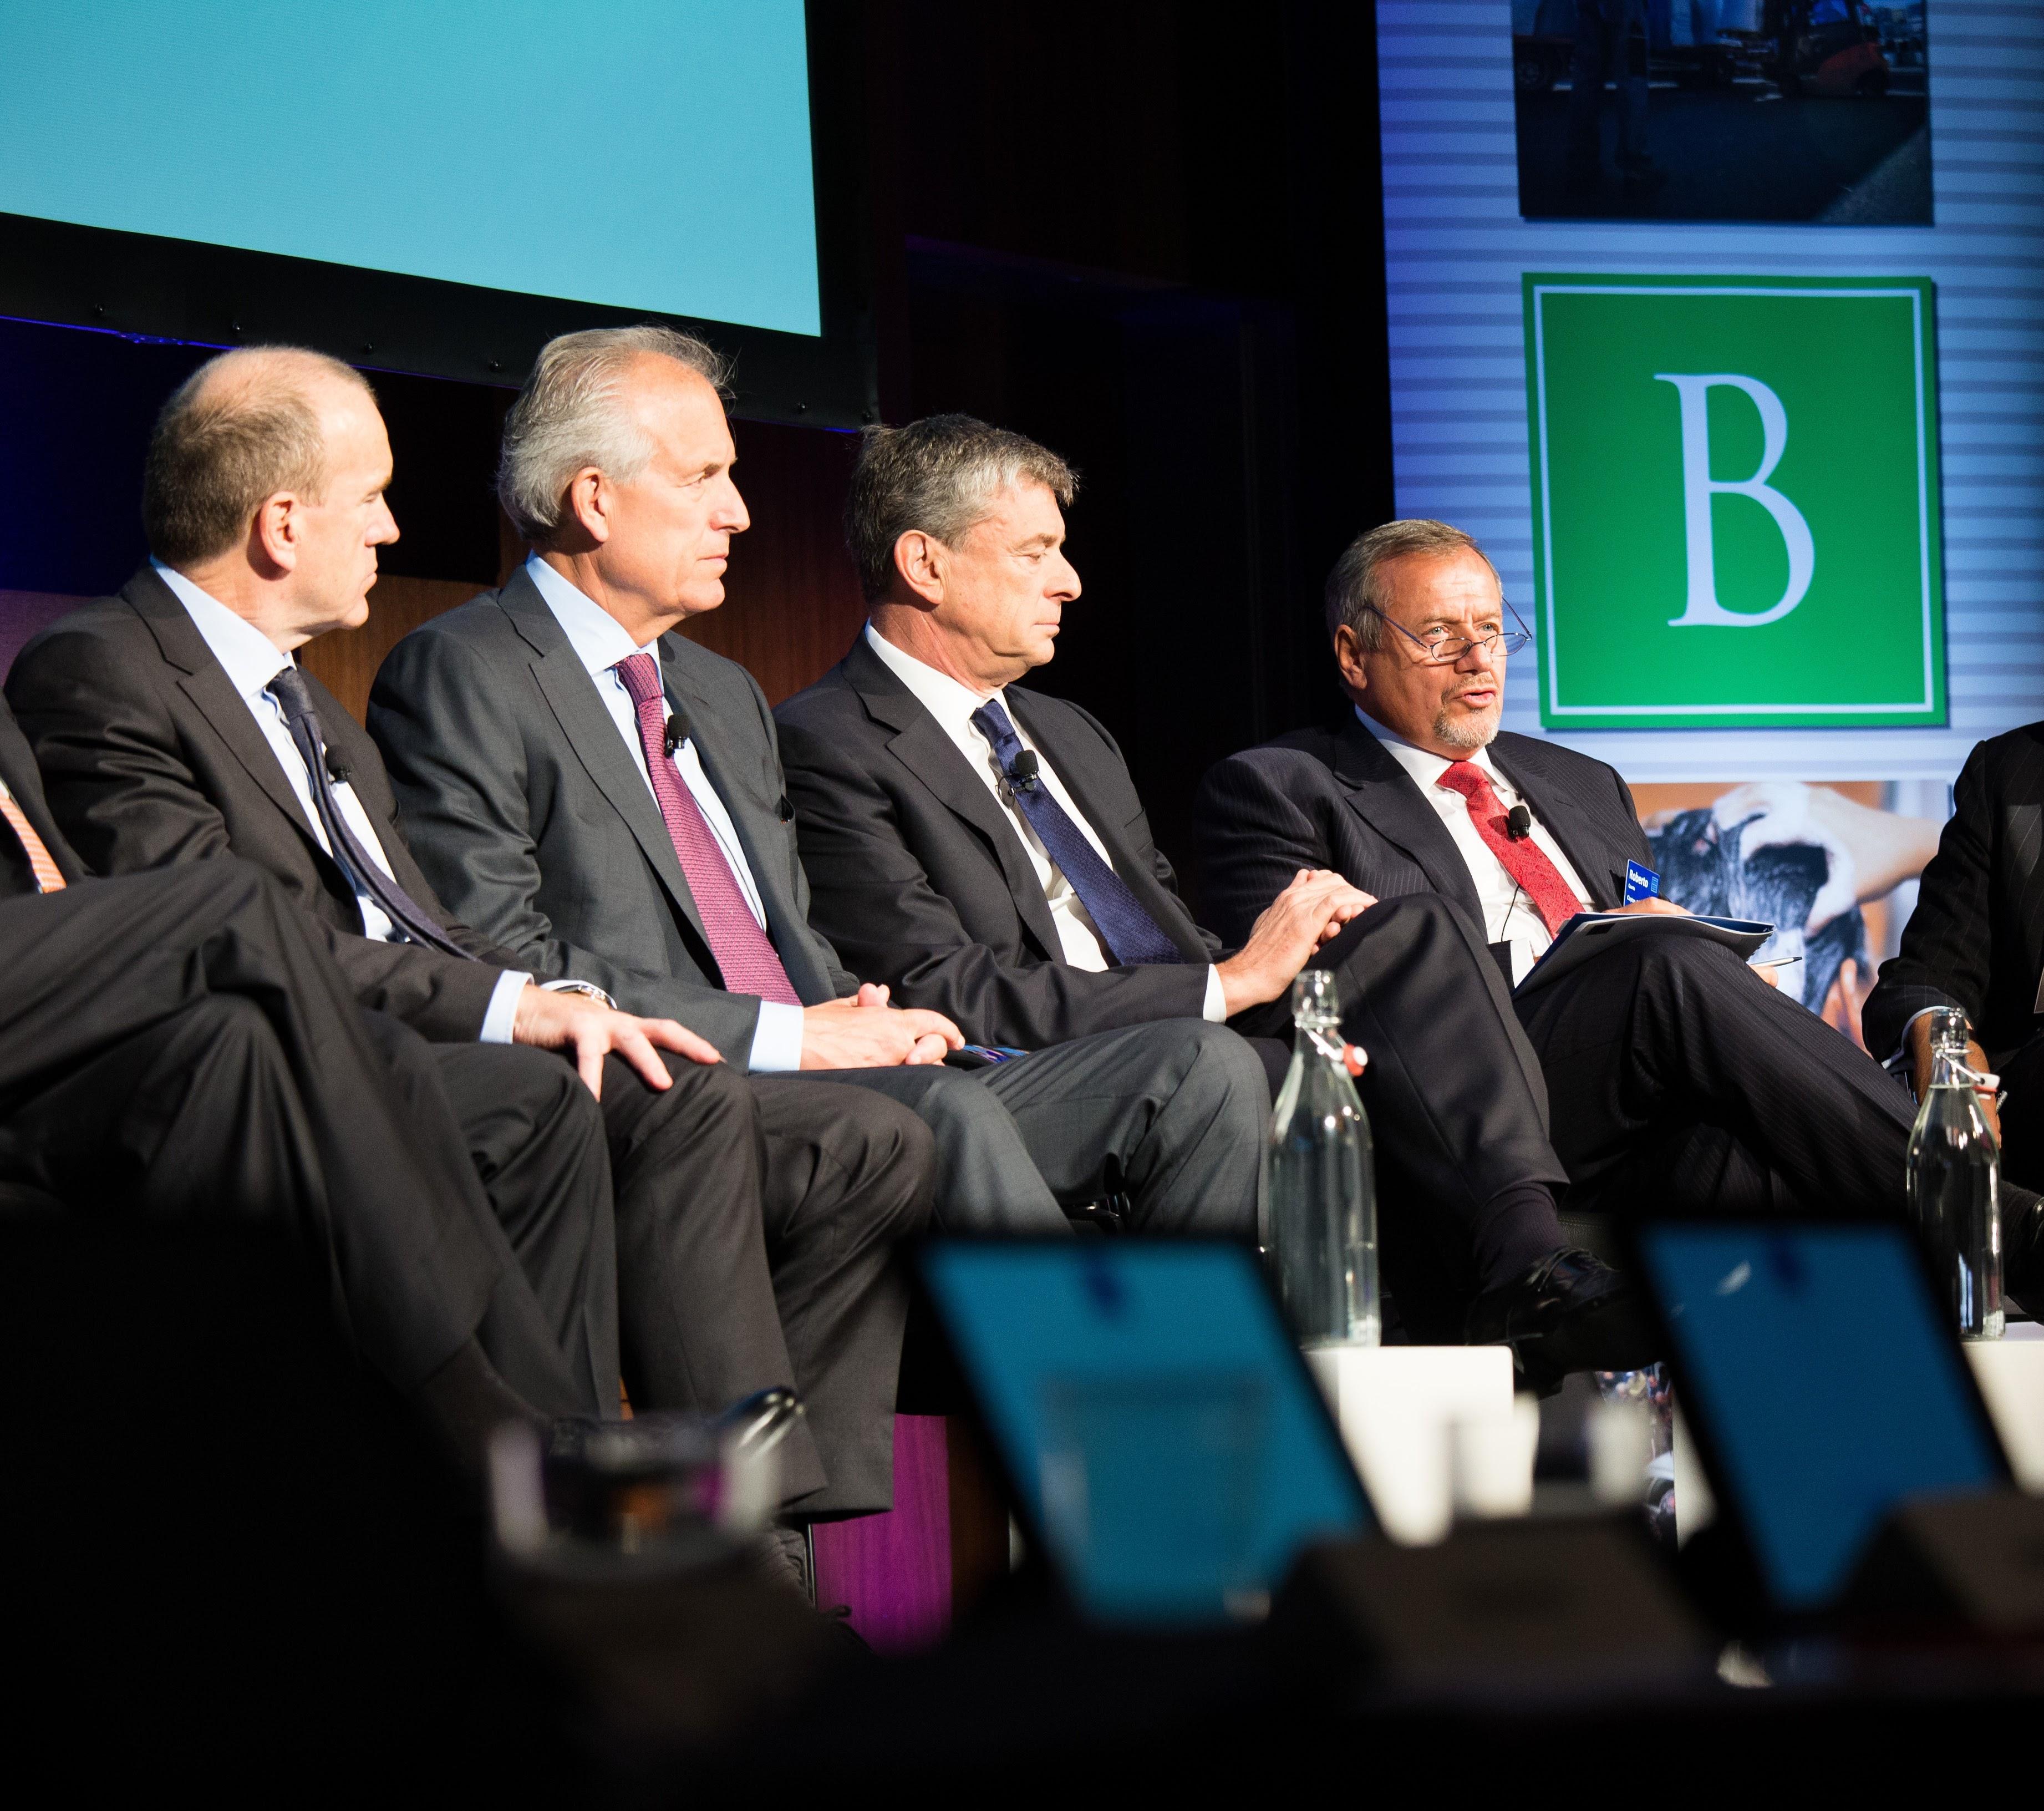 Sir Terry Leahy, Jim McNerney, Paul Presler and Roberto Quarta